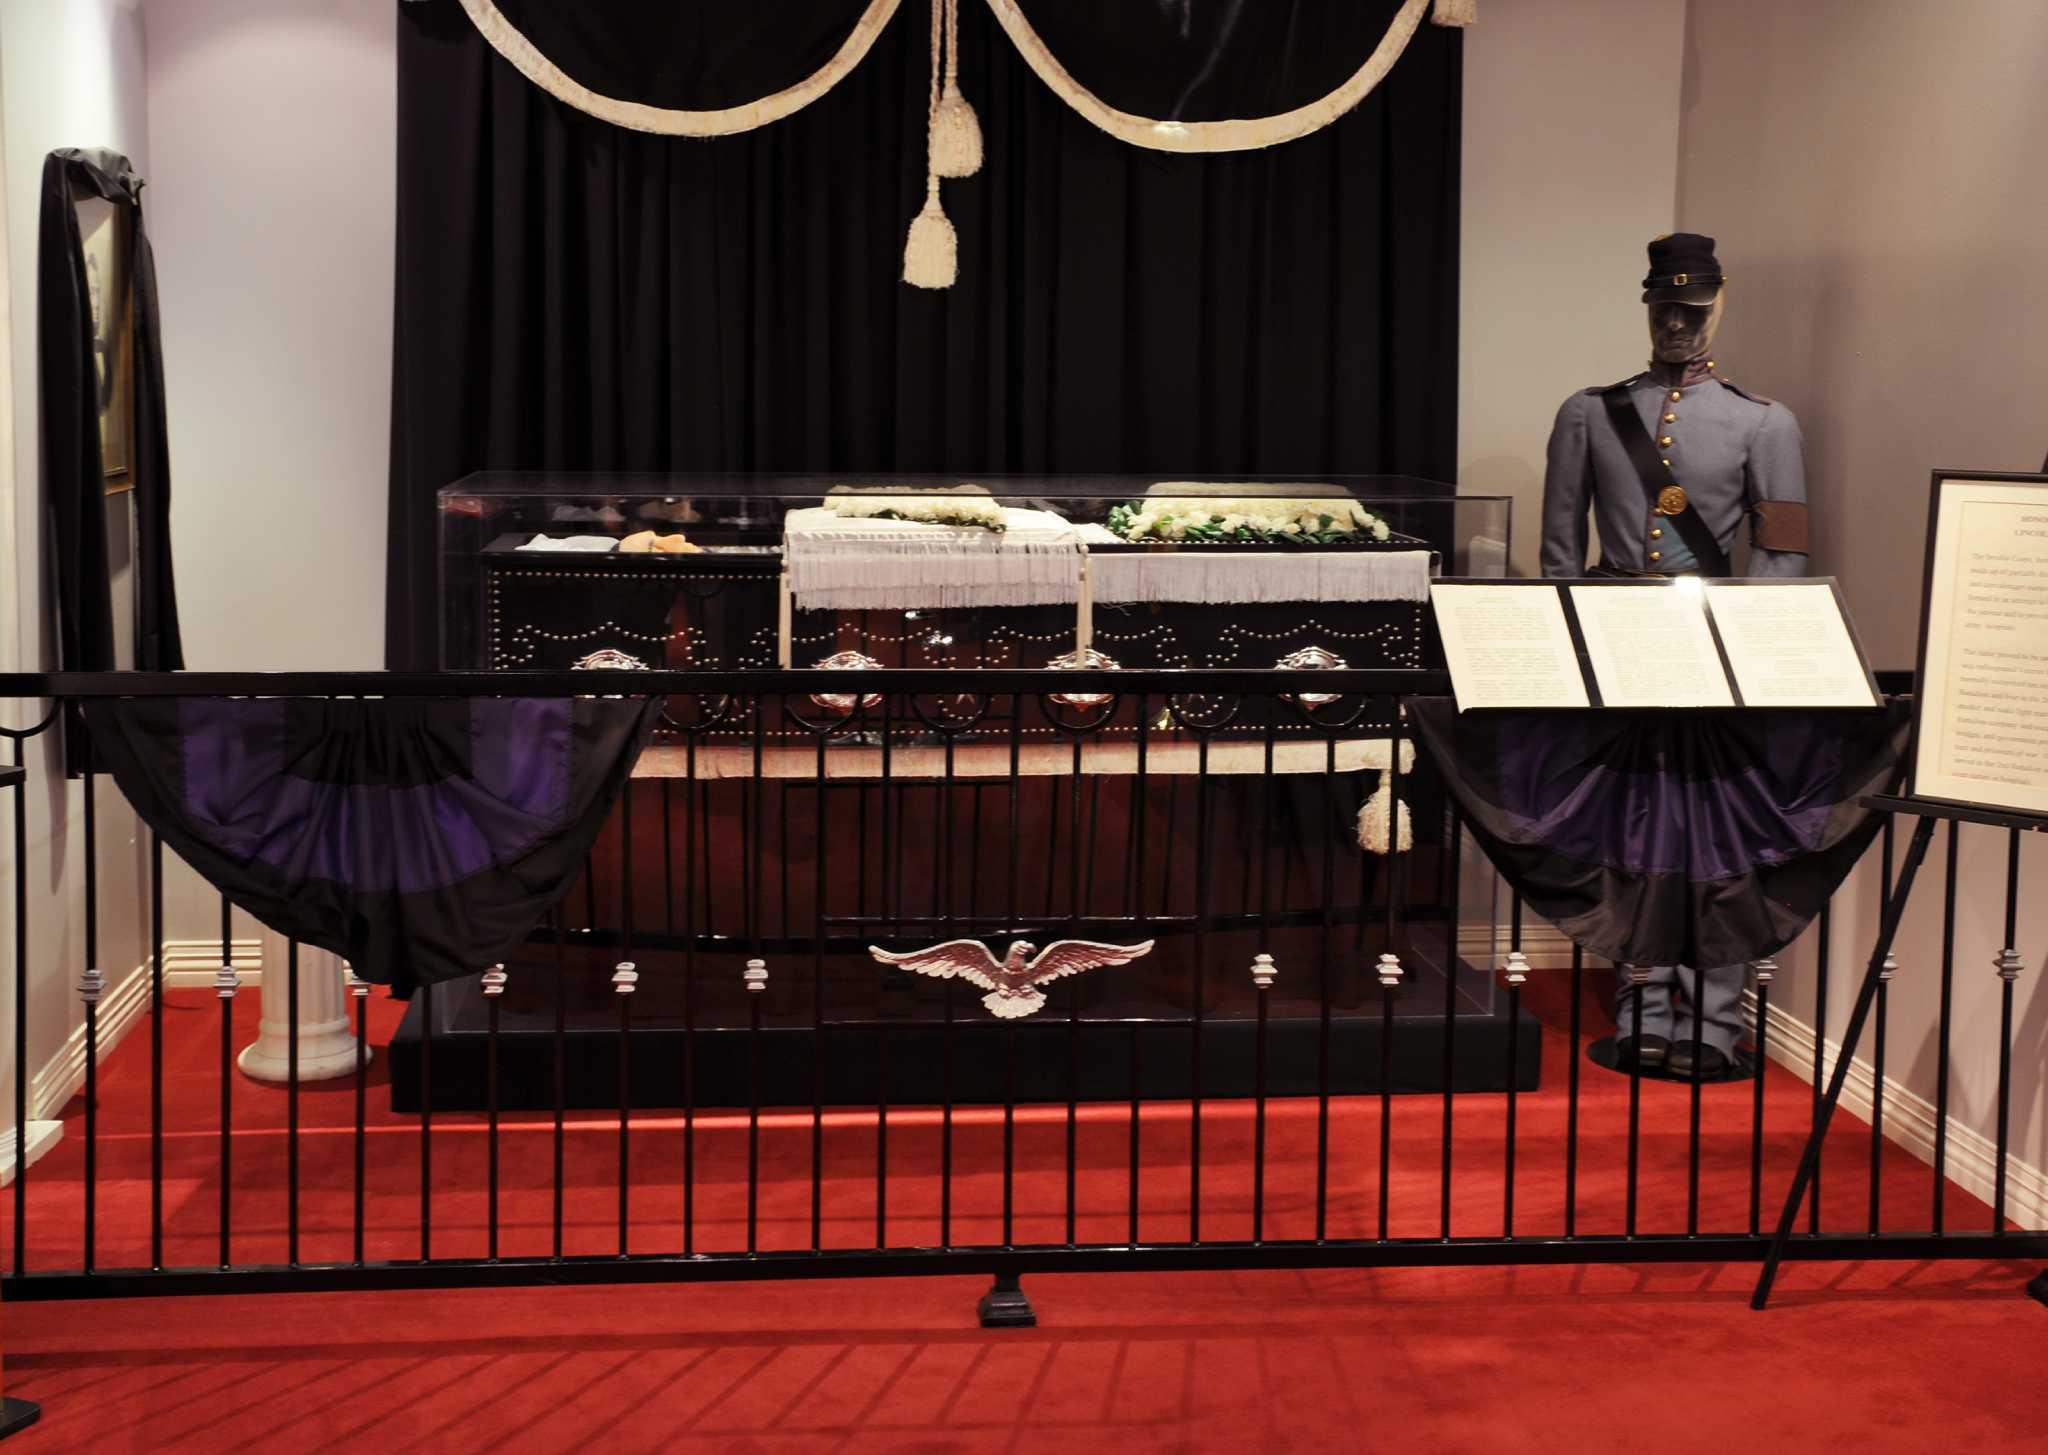 Houston museum collecting macabre lincoln death memorabilia san